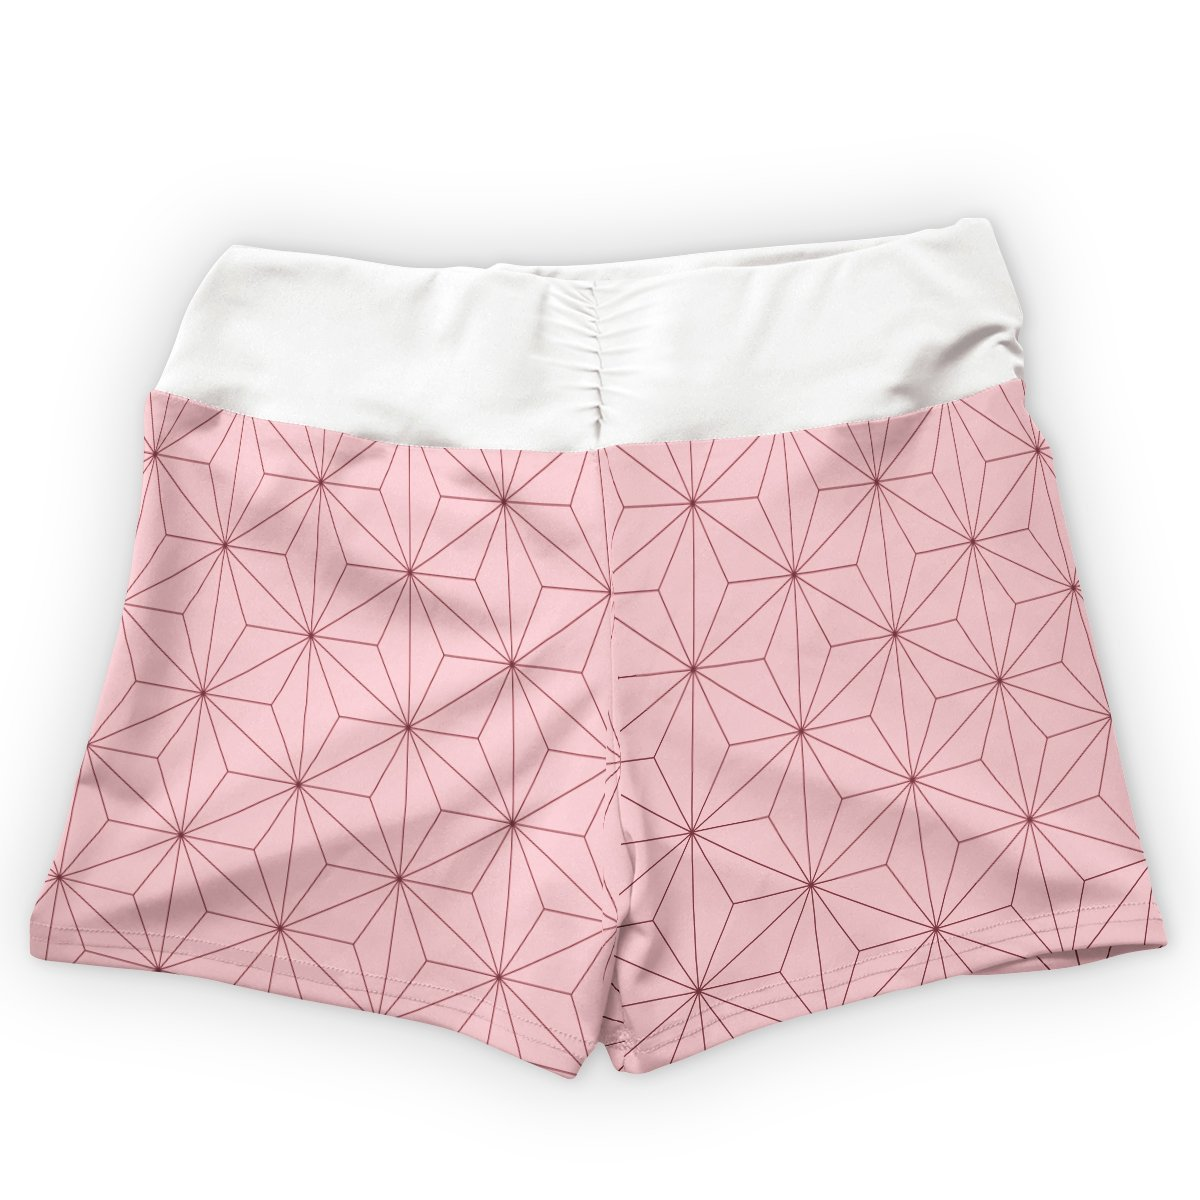 summer nezuko active wear set 110161 - Anime Swimsuits